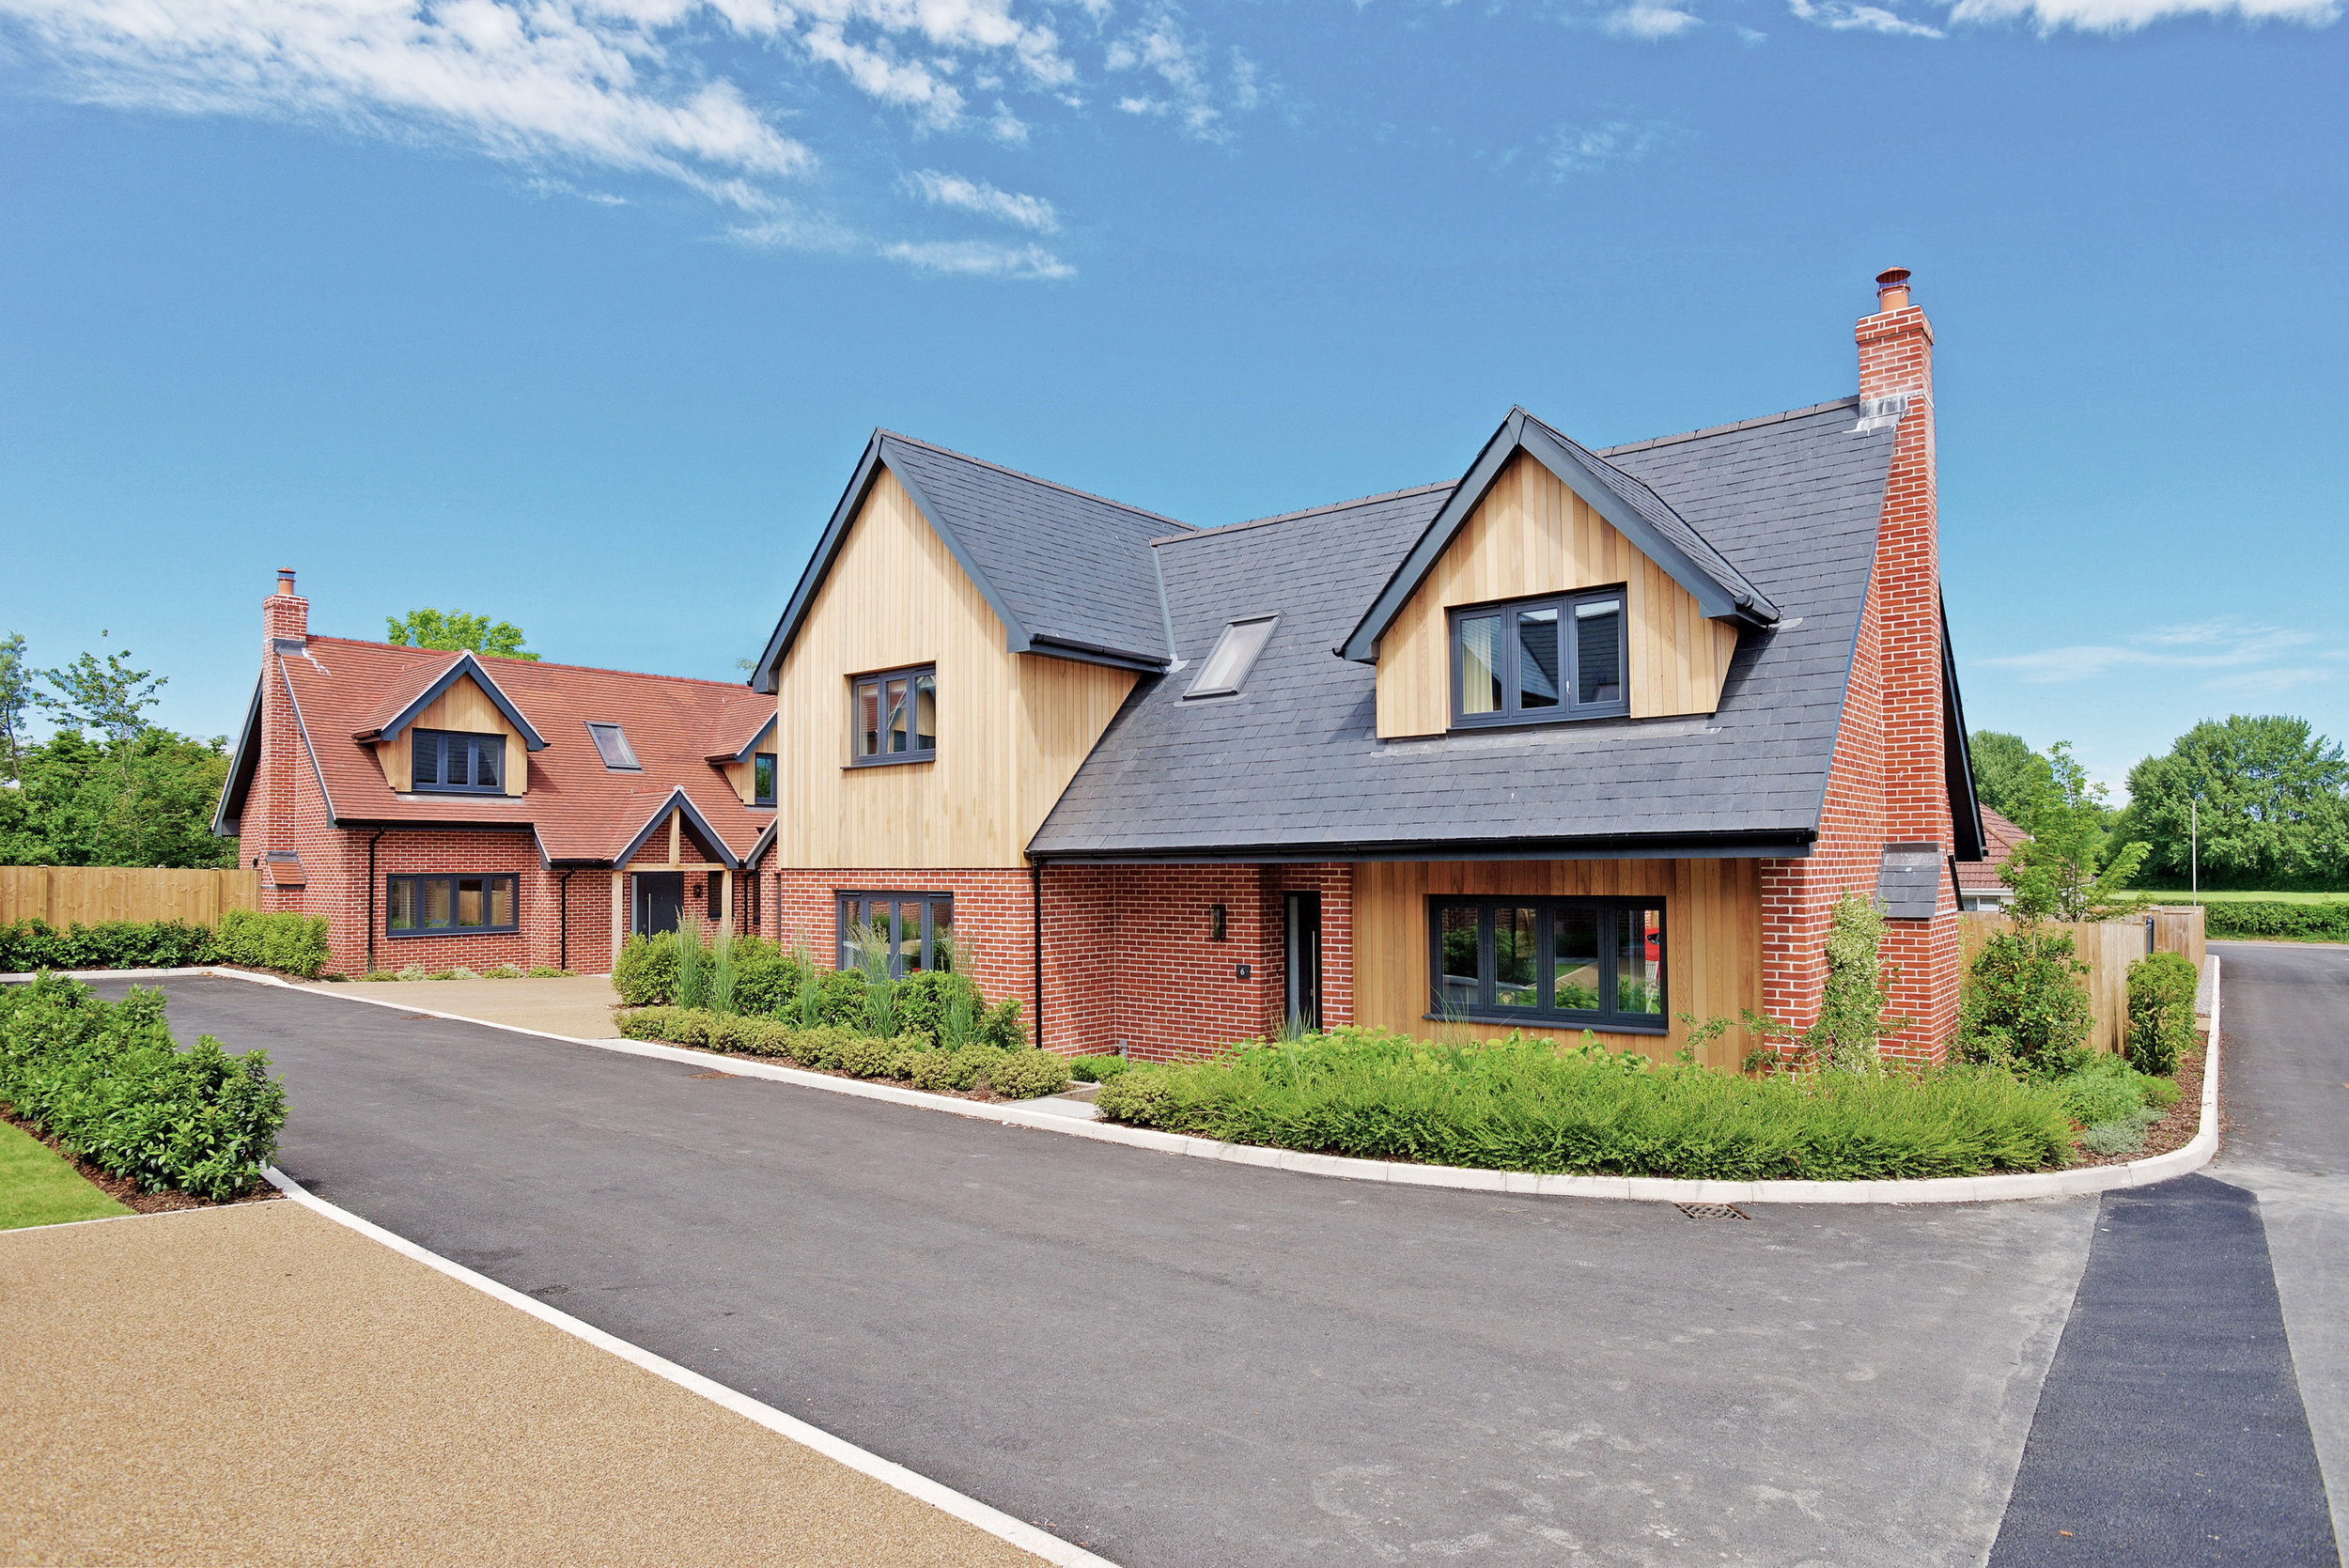 Britford Lane Nursery, Salisbury